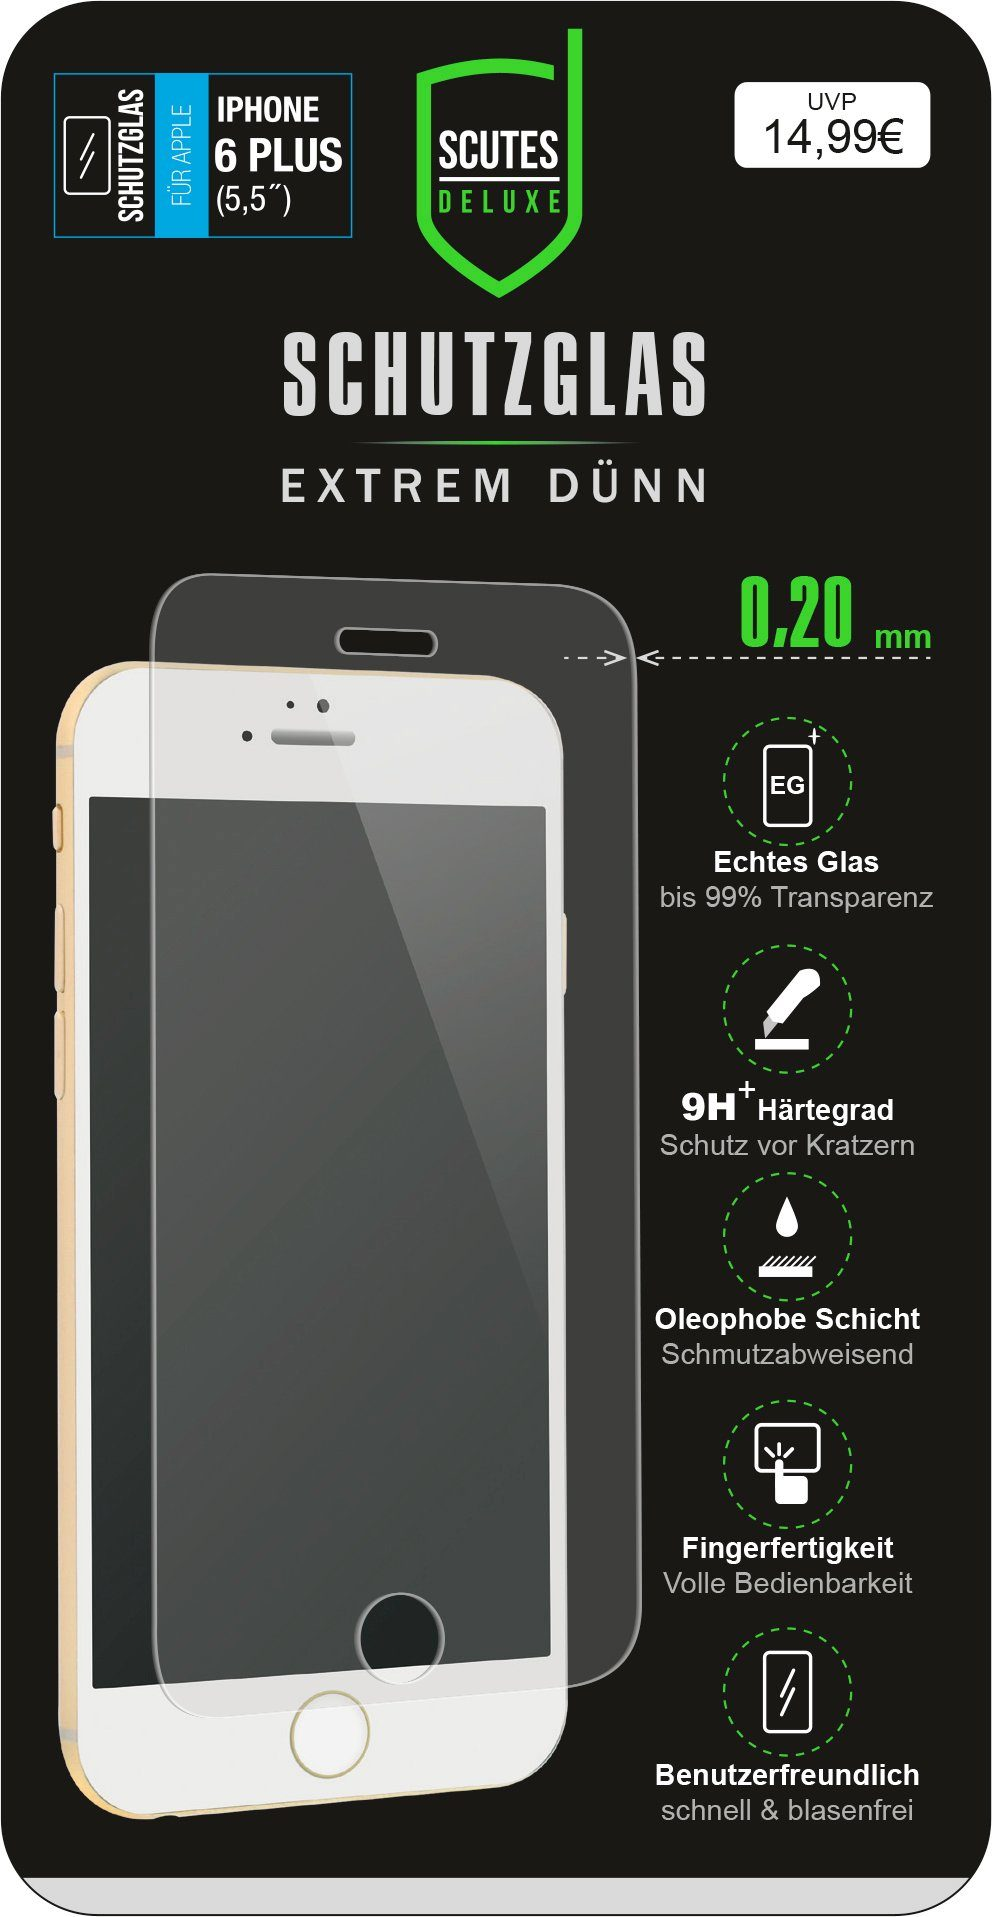 Scutes Deluxe GSM - Zubehör »Schutzglas - iPhone 6/S plus«